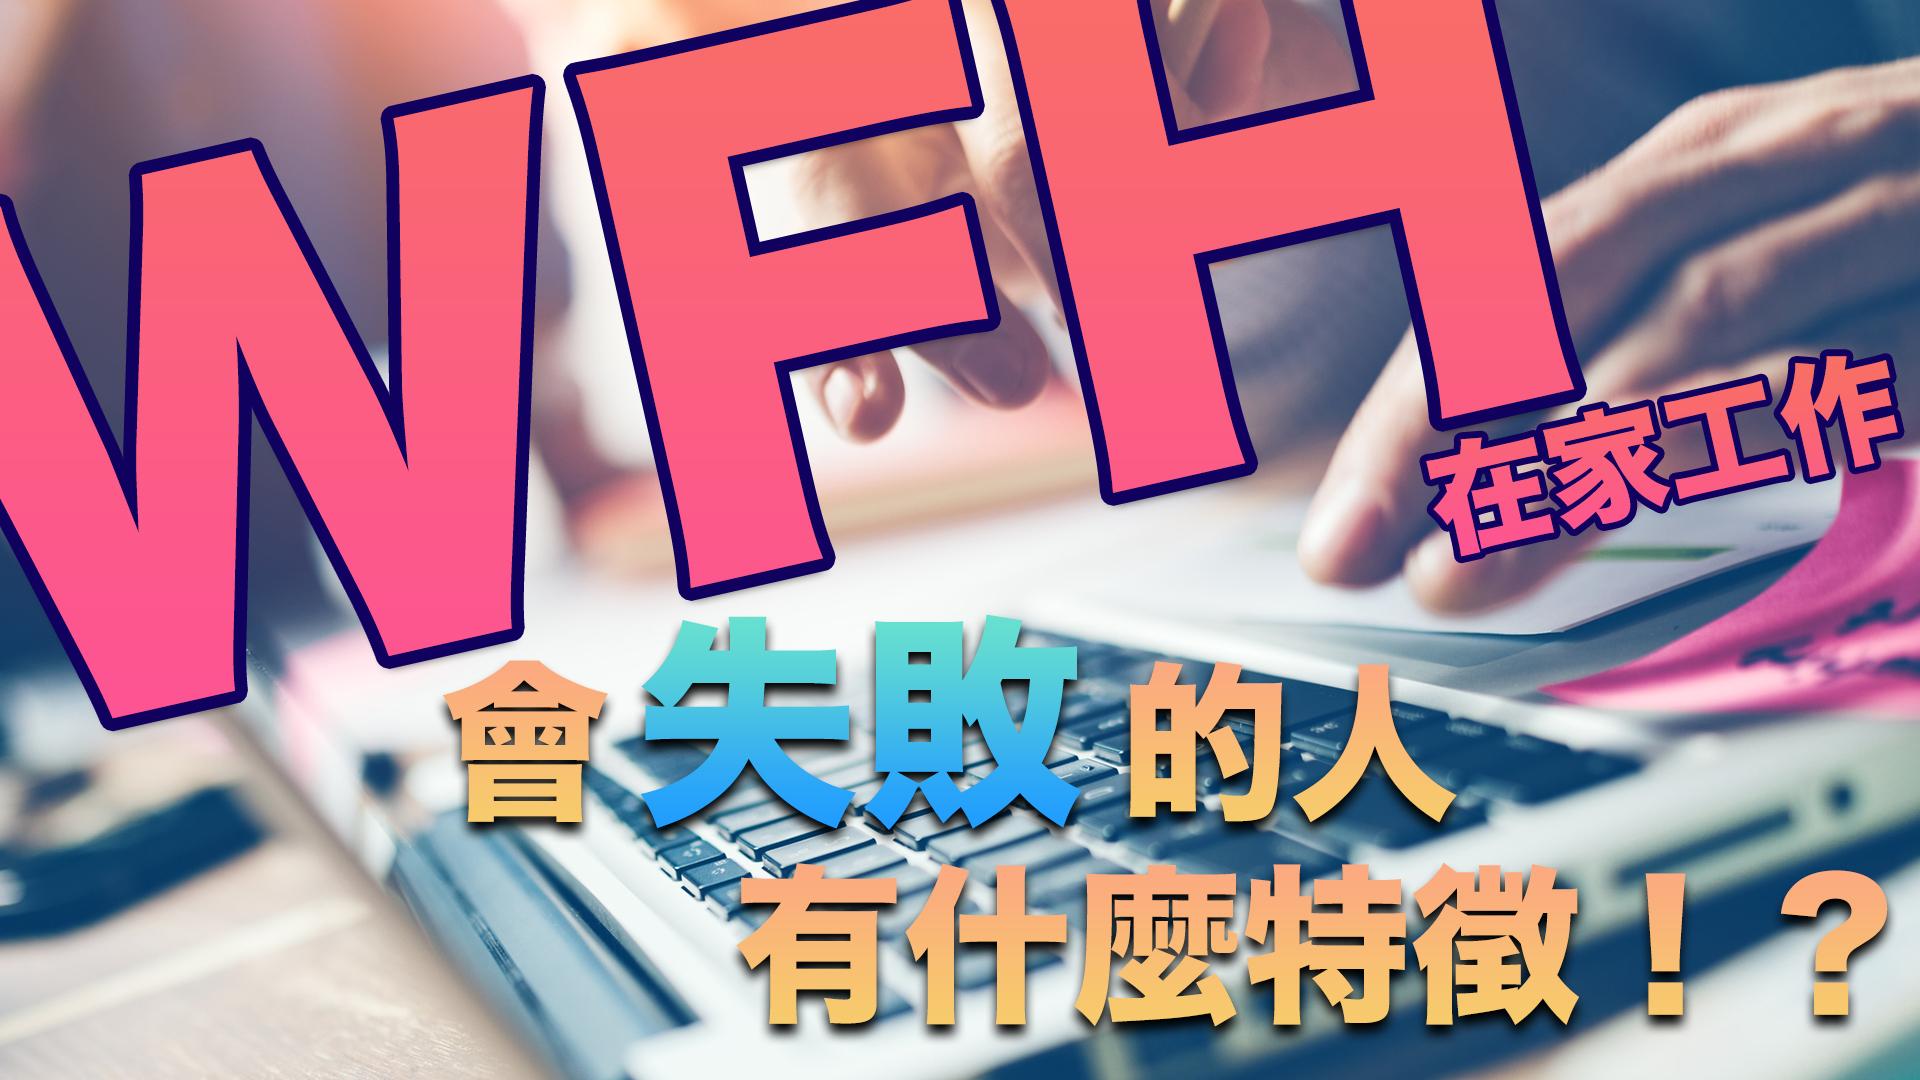 「WFH・在家工作」會失敗的人,有什麼特徵!? /WFH・テレワークに失敗する人の特徴